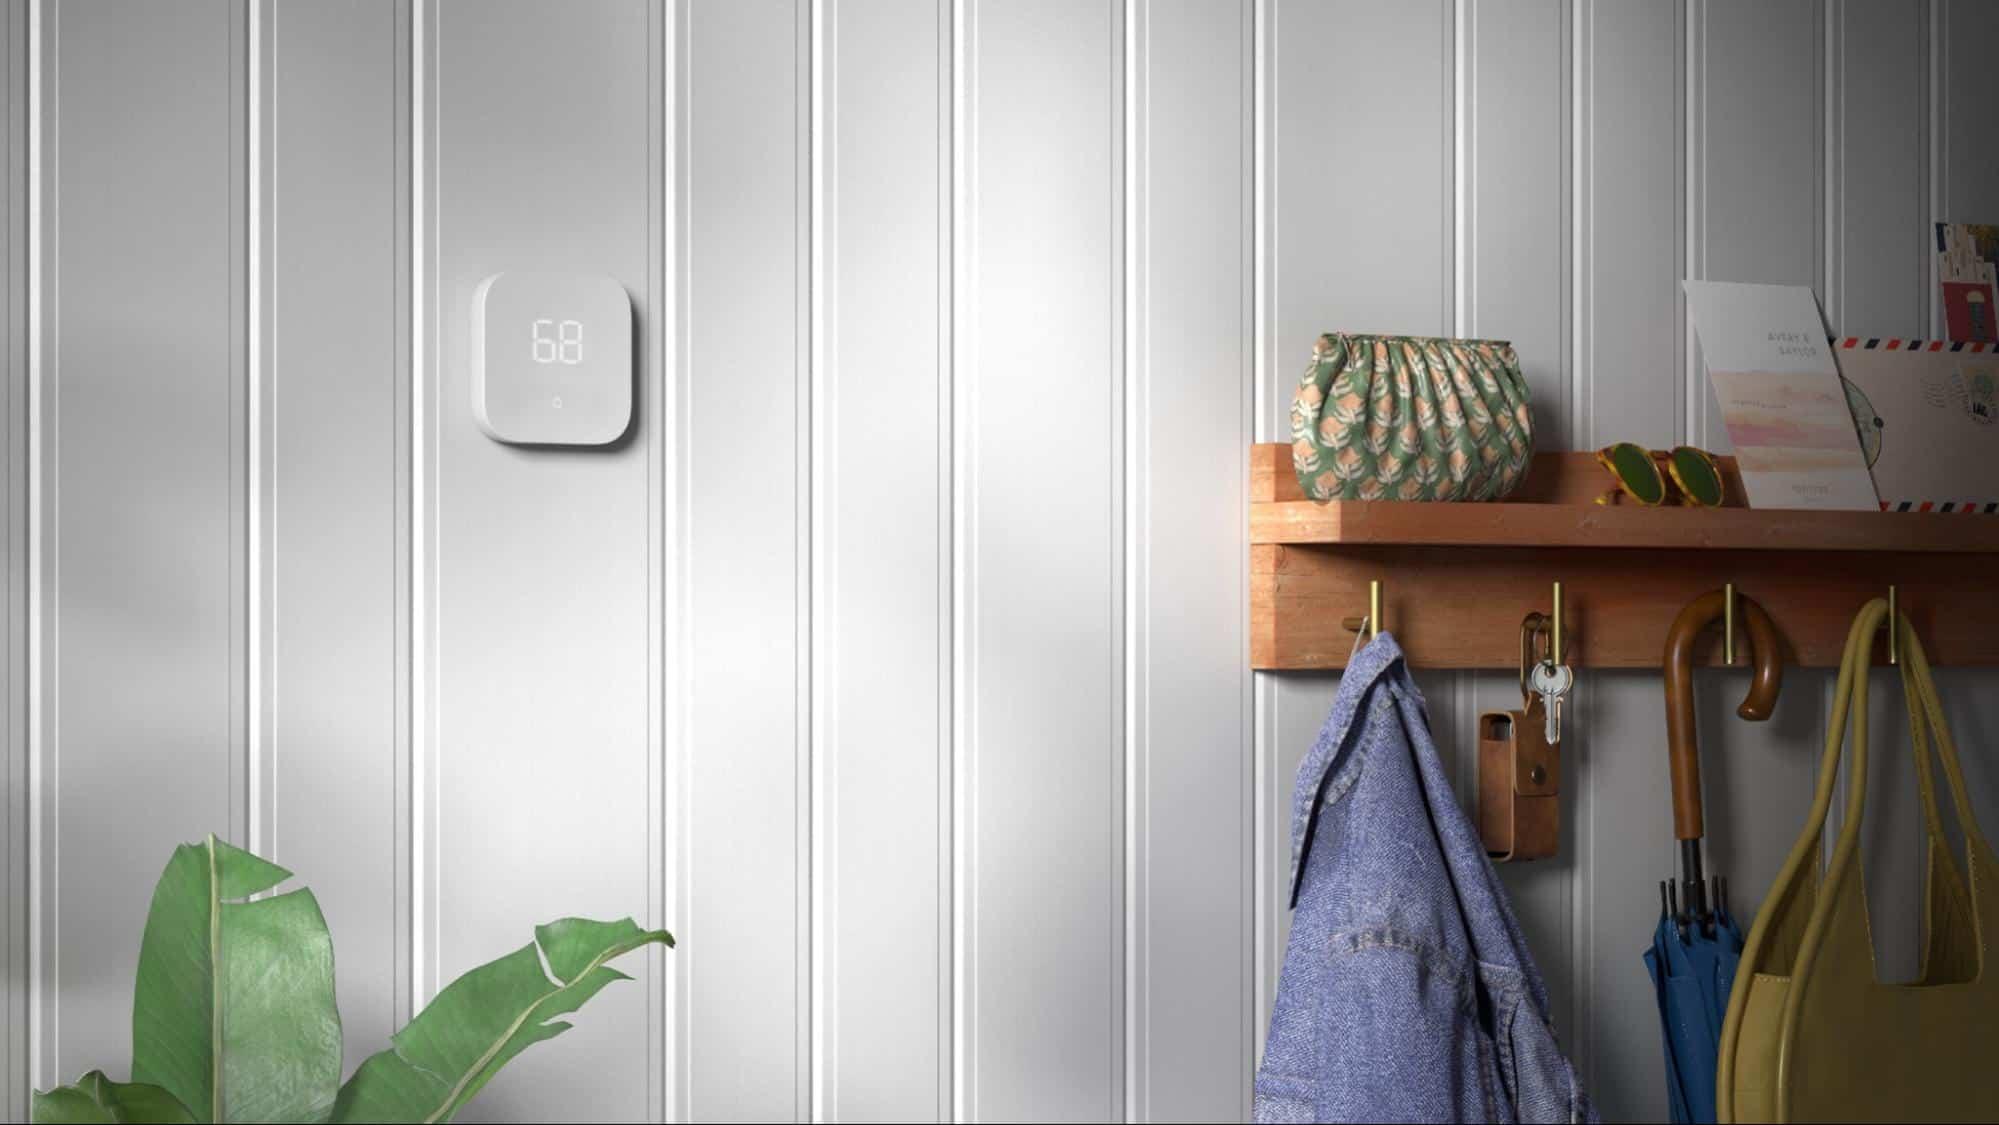 Amazon Smart Thermostat (Photo: Amazon)